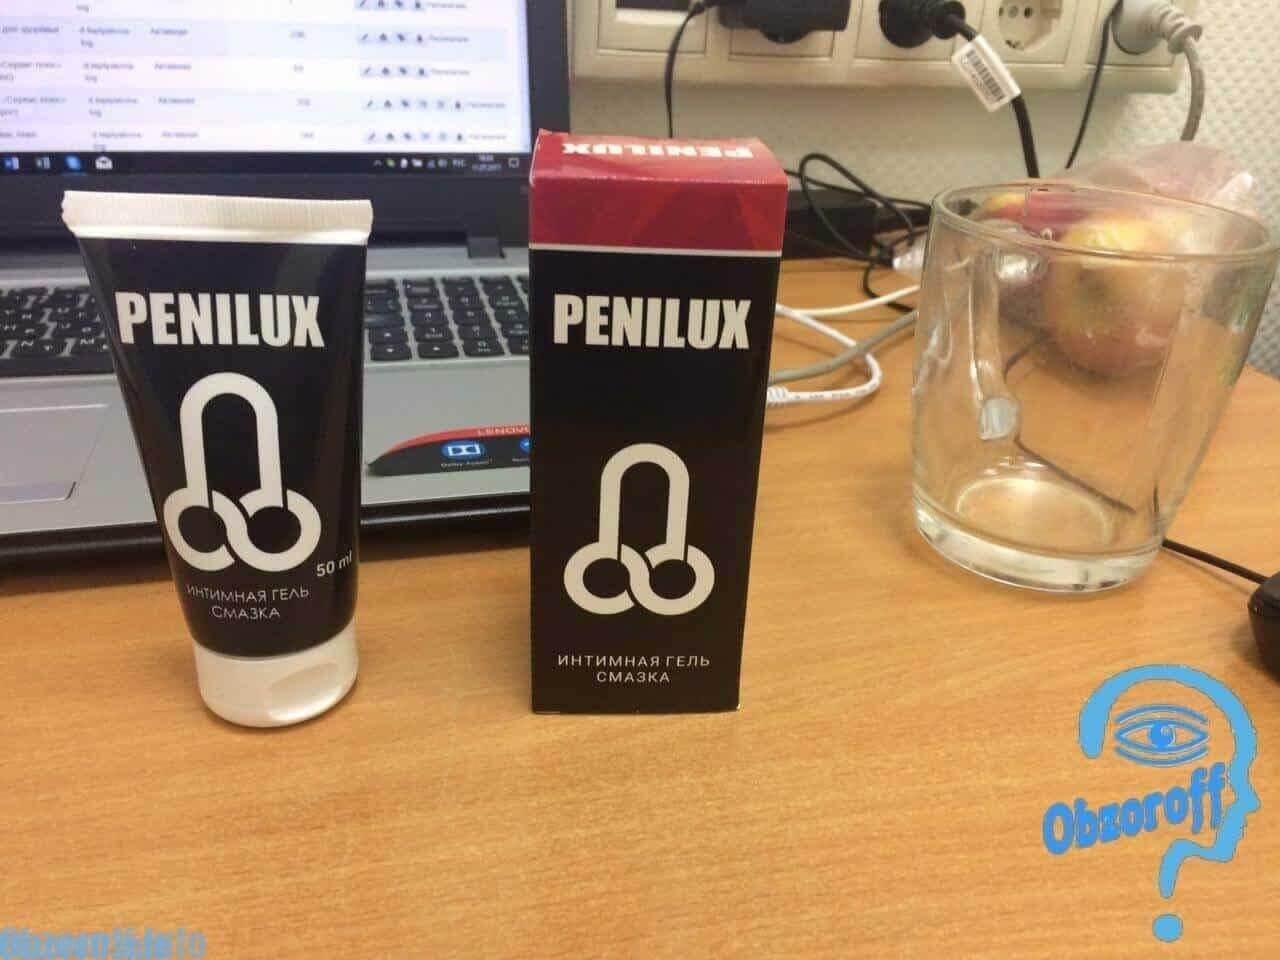 Crema para agrandar el pene Penilux Gel caja y tubo